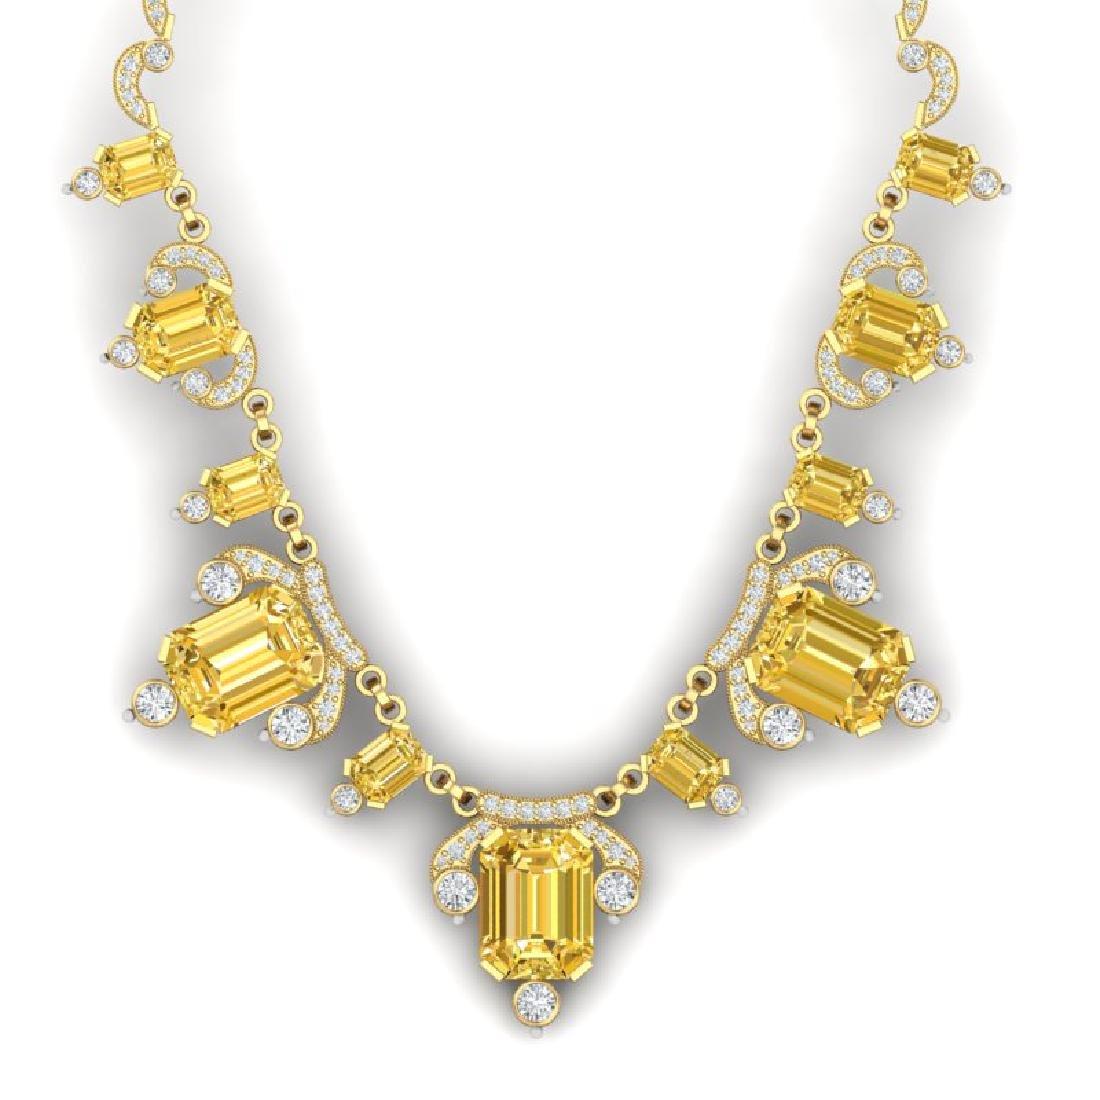 71.48 CTW Royalty Canary Citrine & VS Diamond Necklace